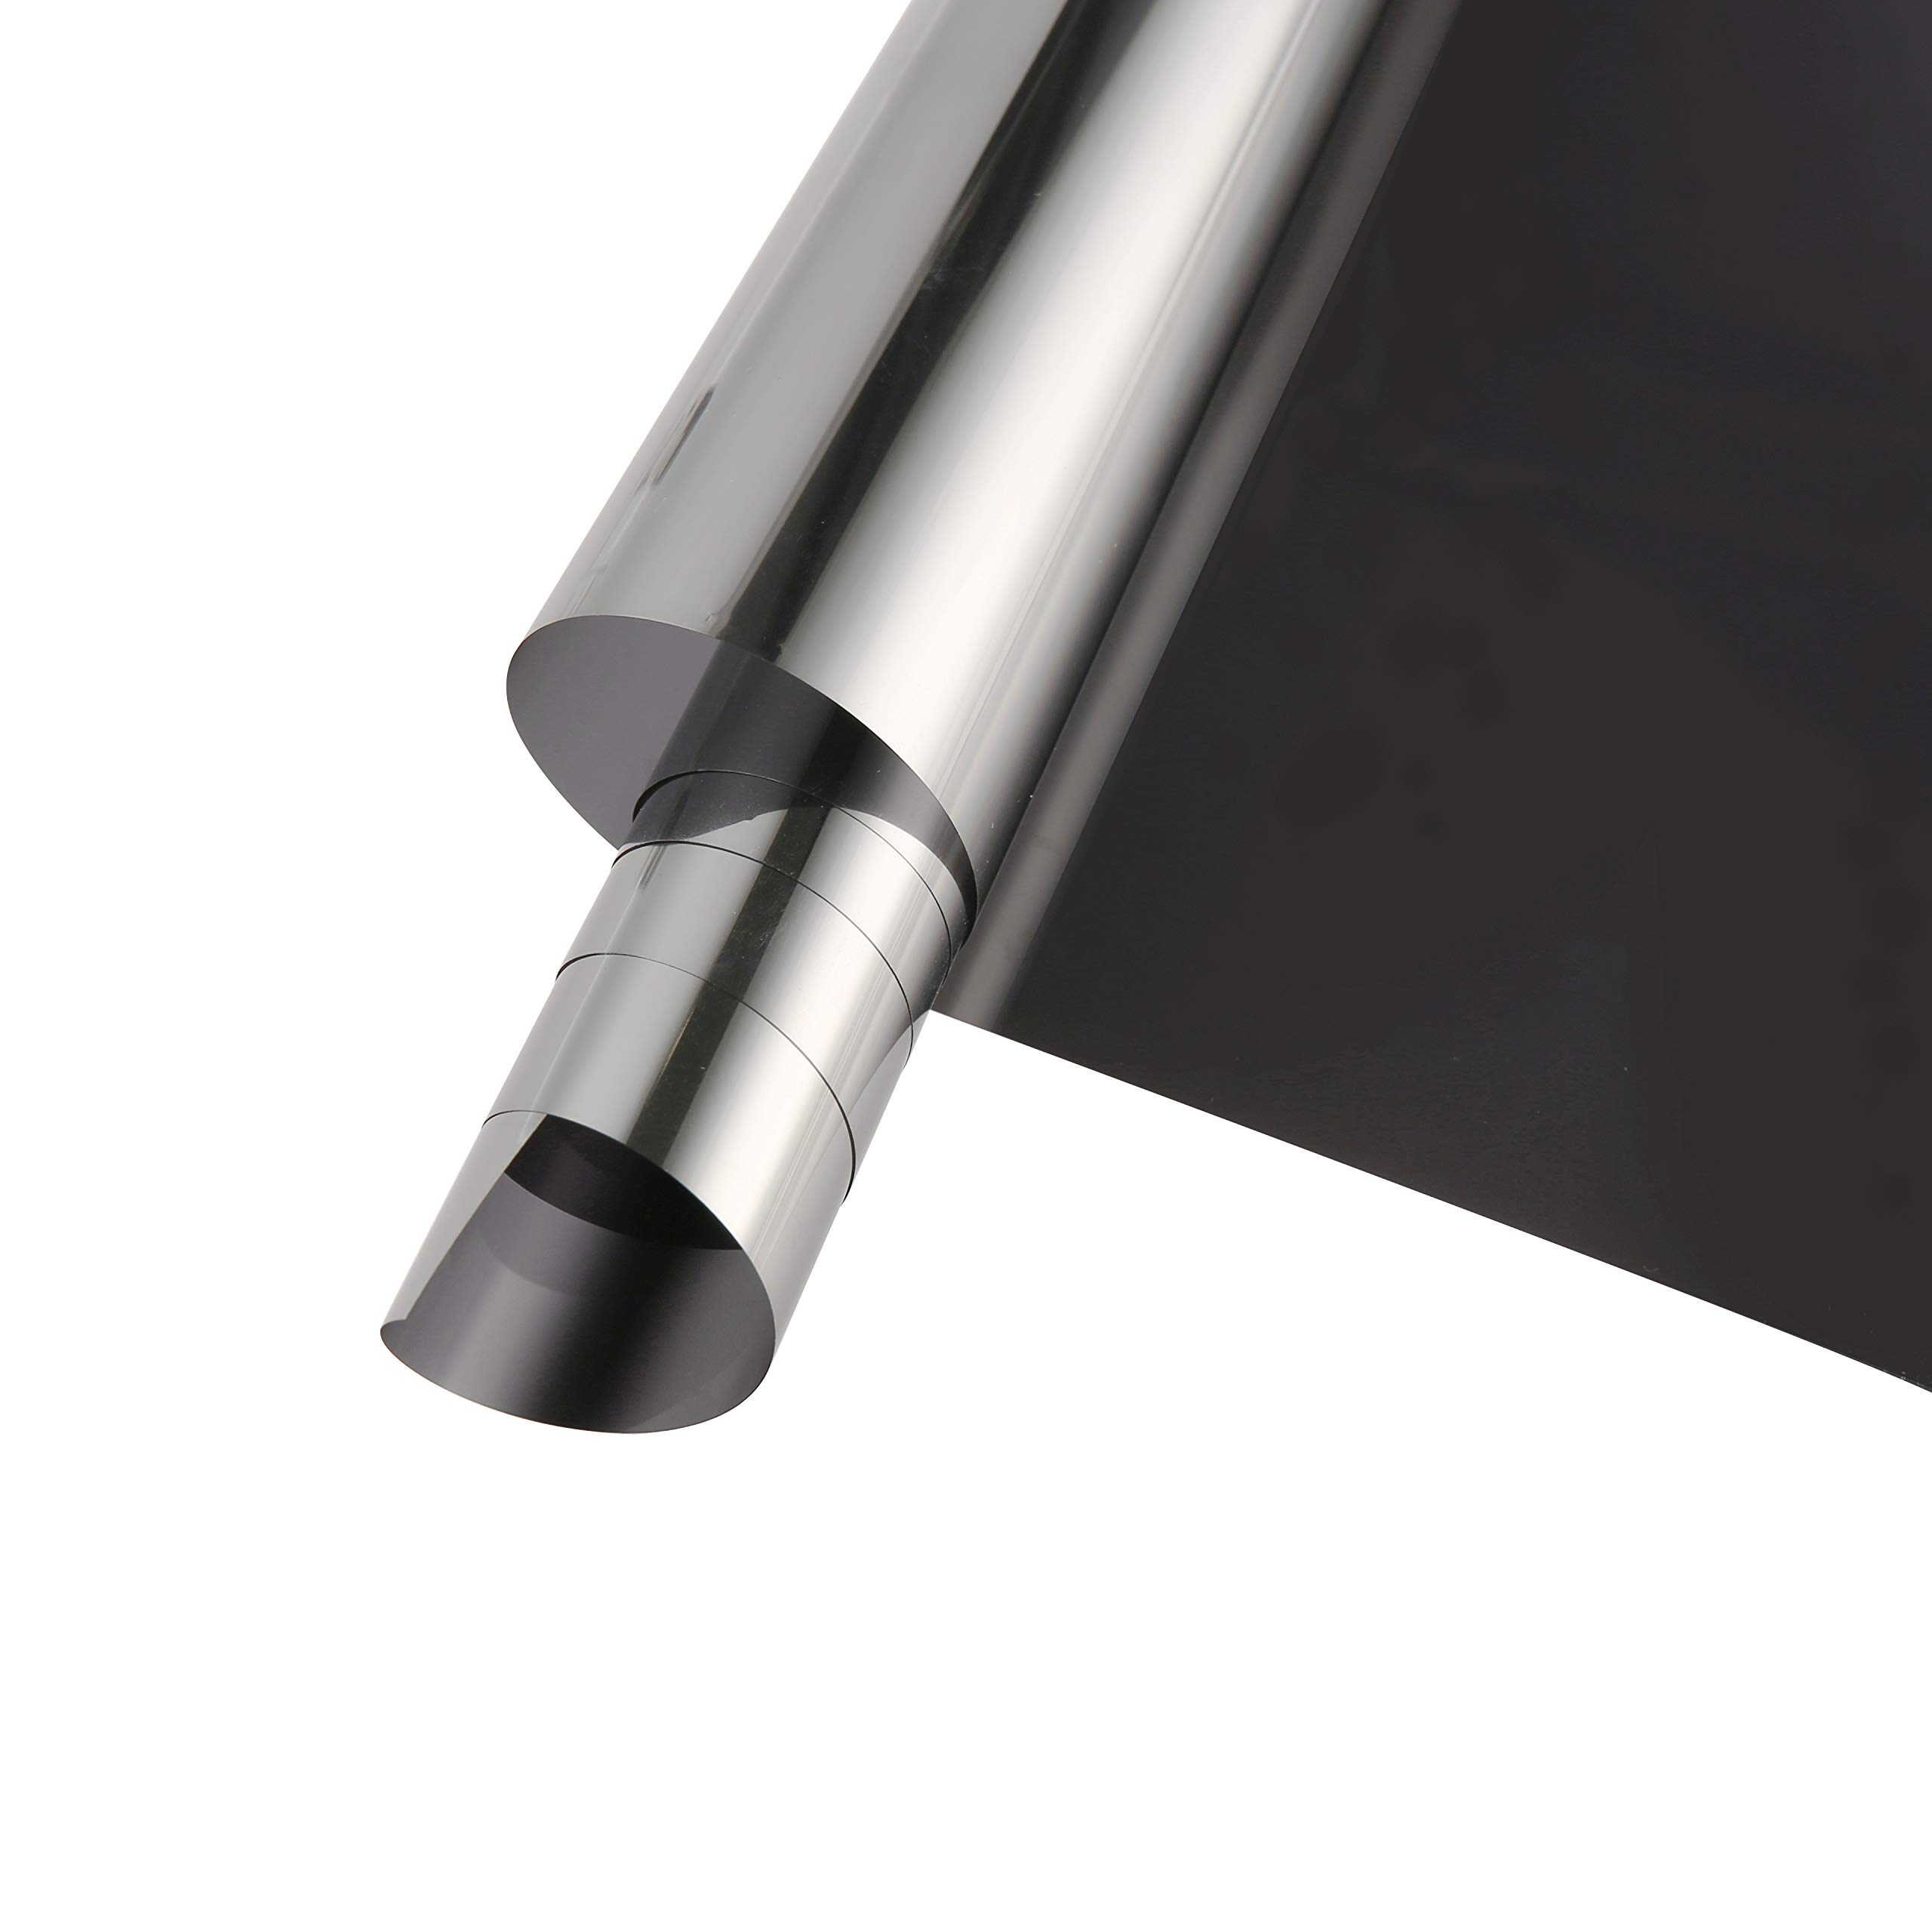 SW One Way Mirror Film Adhesive Reflective Privacy Window Film Heat Control Anti UV Window Tint, 60Inch x 33Feet, Black Silver